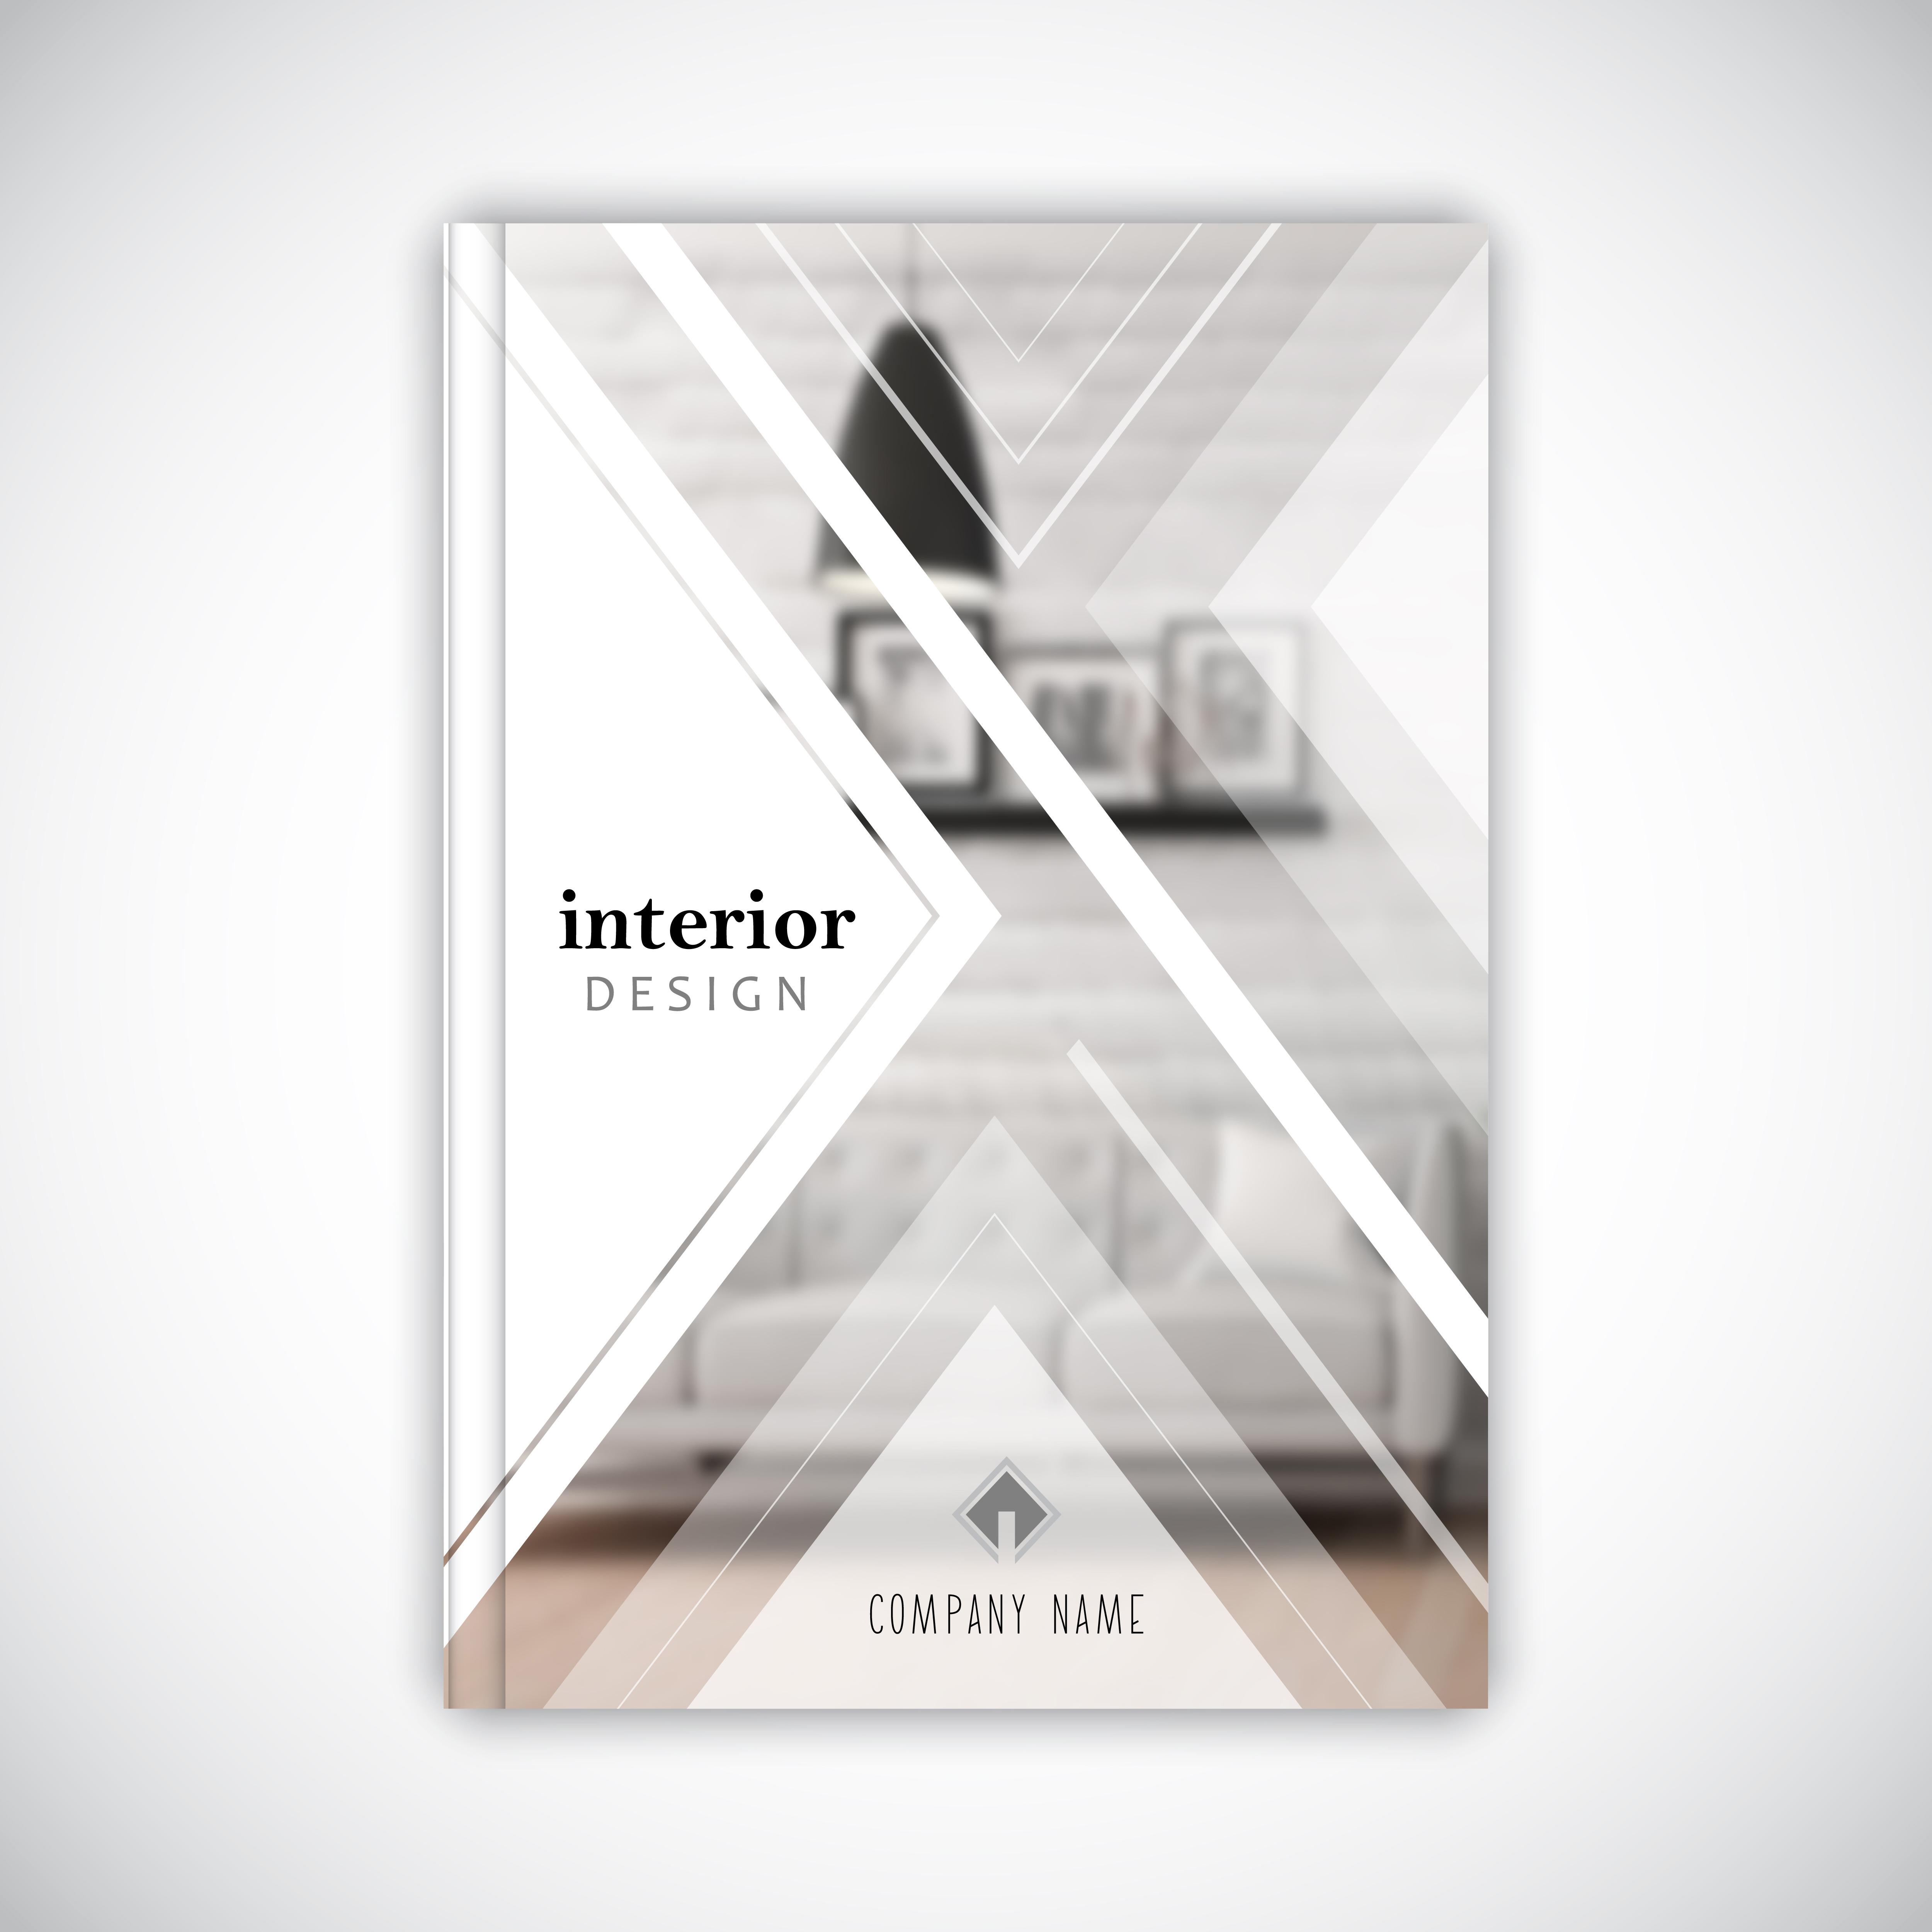 Design Template For An Interior Design Business Brochure Download Free Vectors Clipart Graphics Vector Art